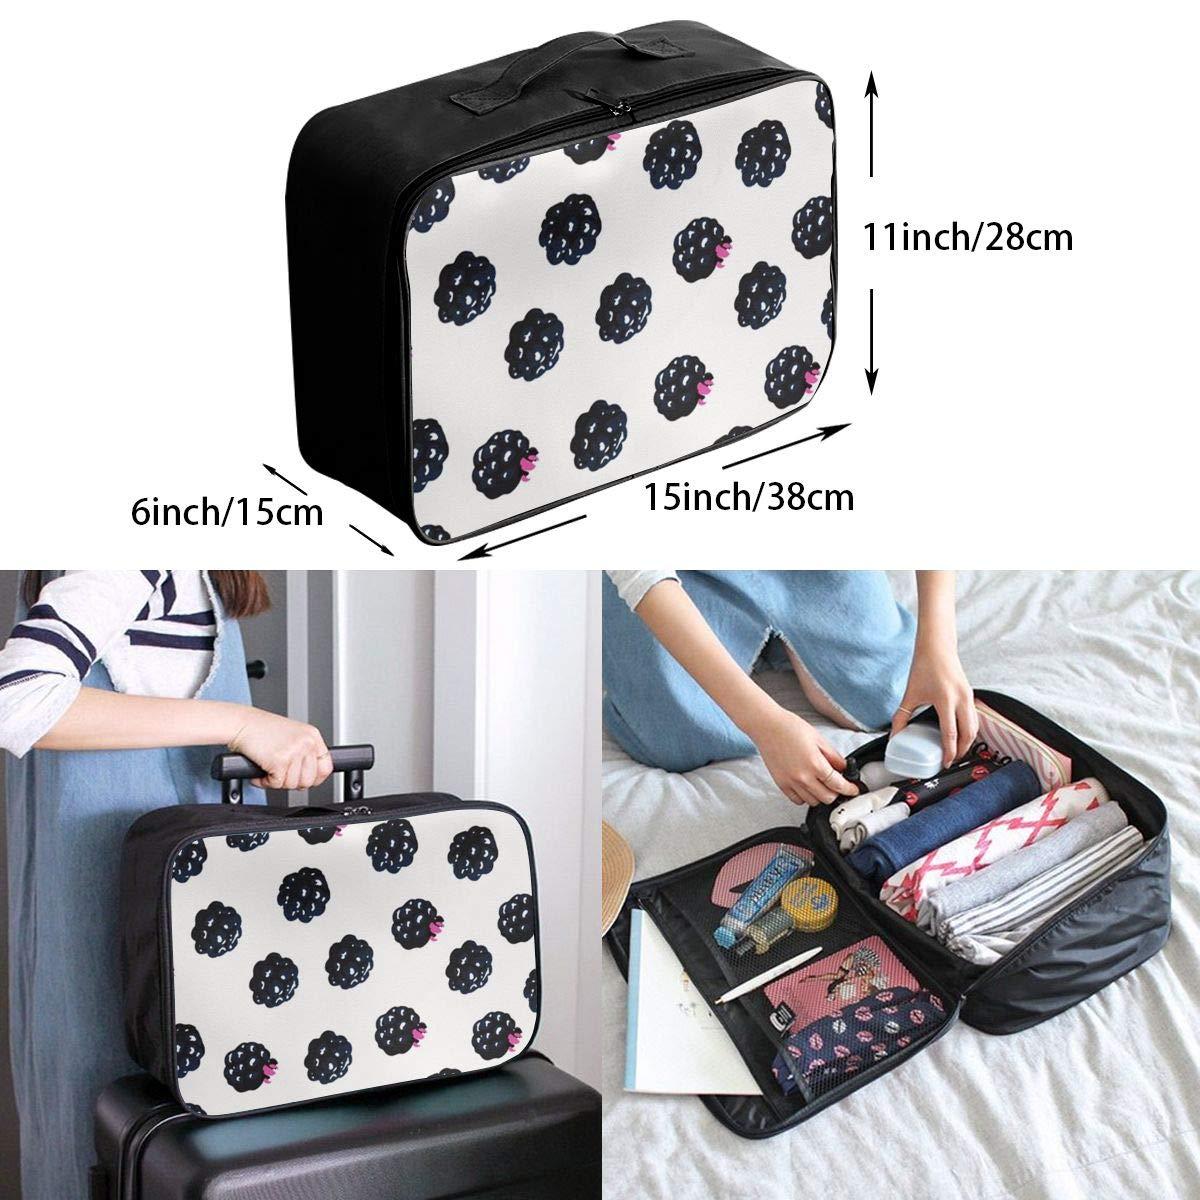 Travel Luggage Duffle Bag Lightweight Portable Handbag Blueberry Large Capacity Waterproof Foldable Storage Tote